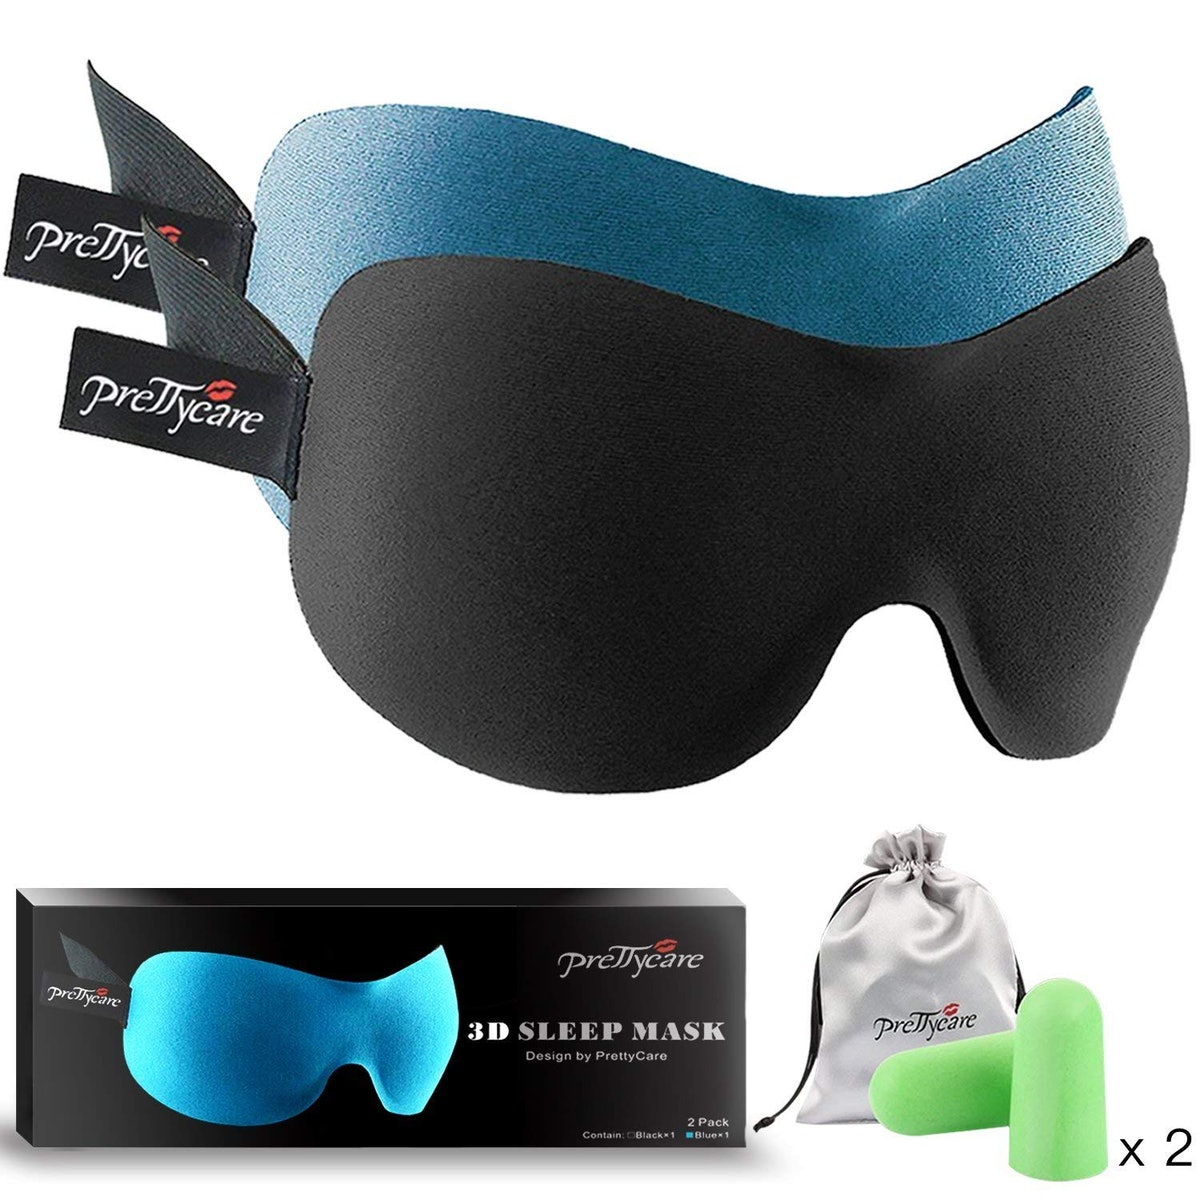 PrettyCare 3D Sleep Mask (2 Pack)